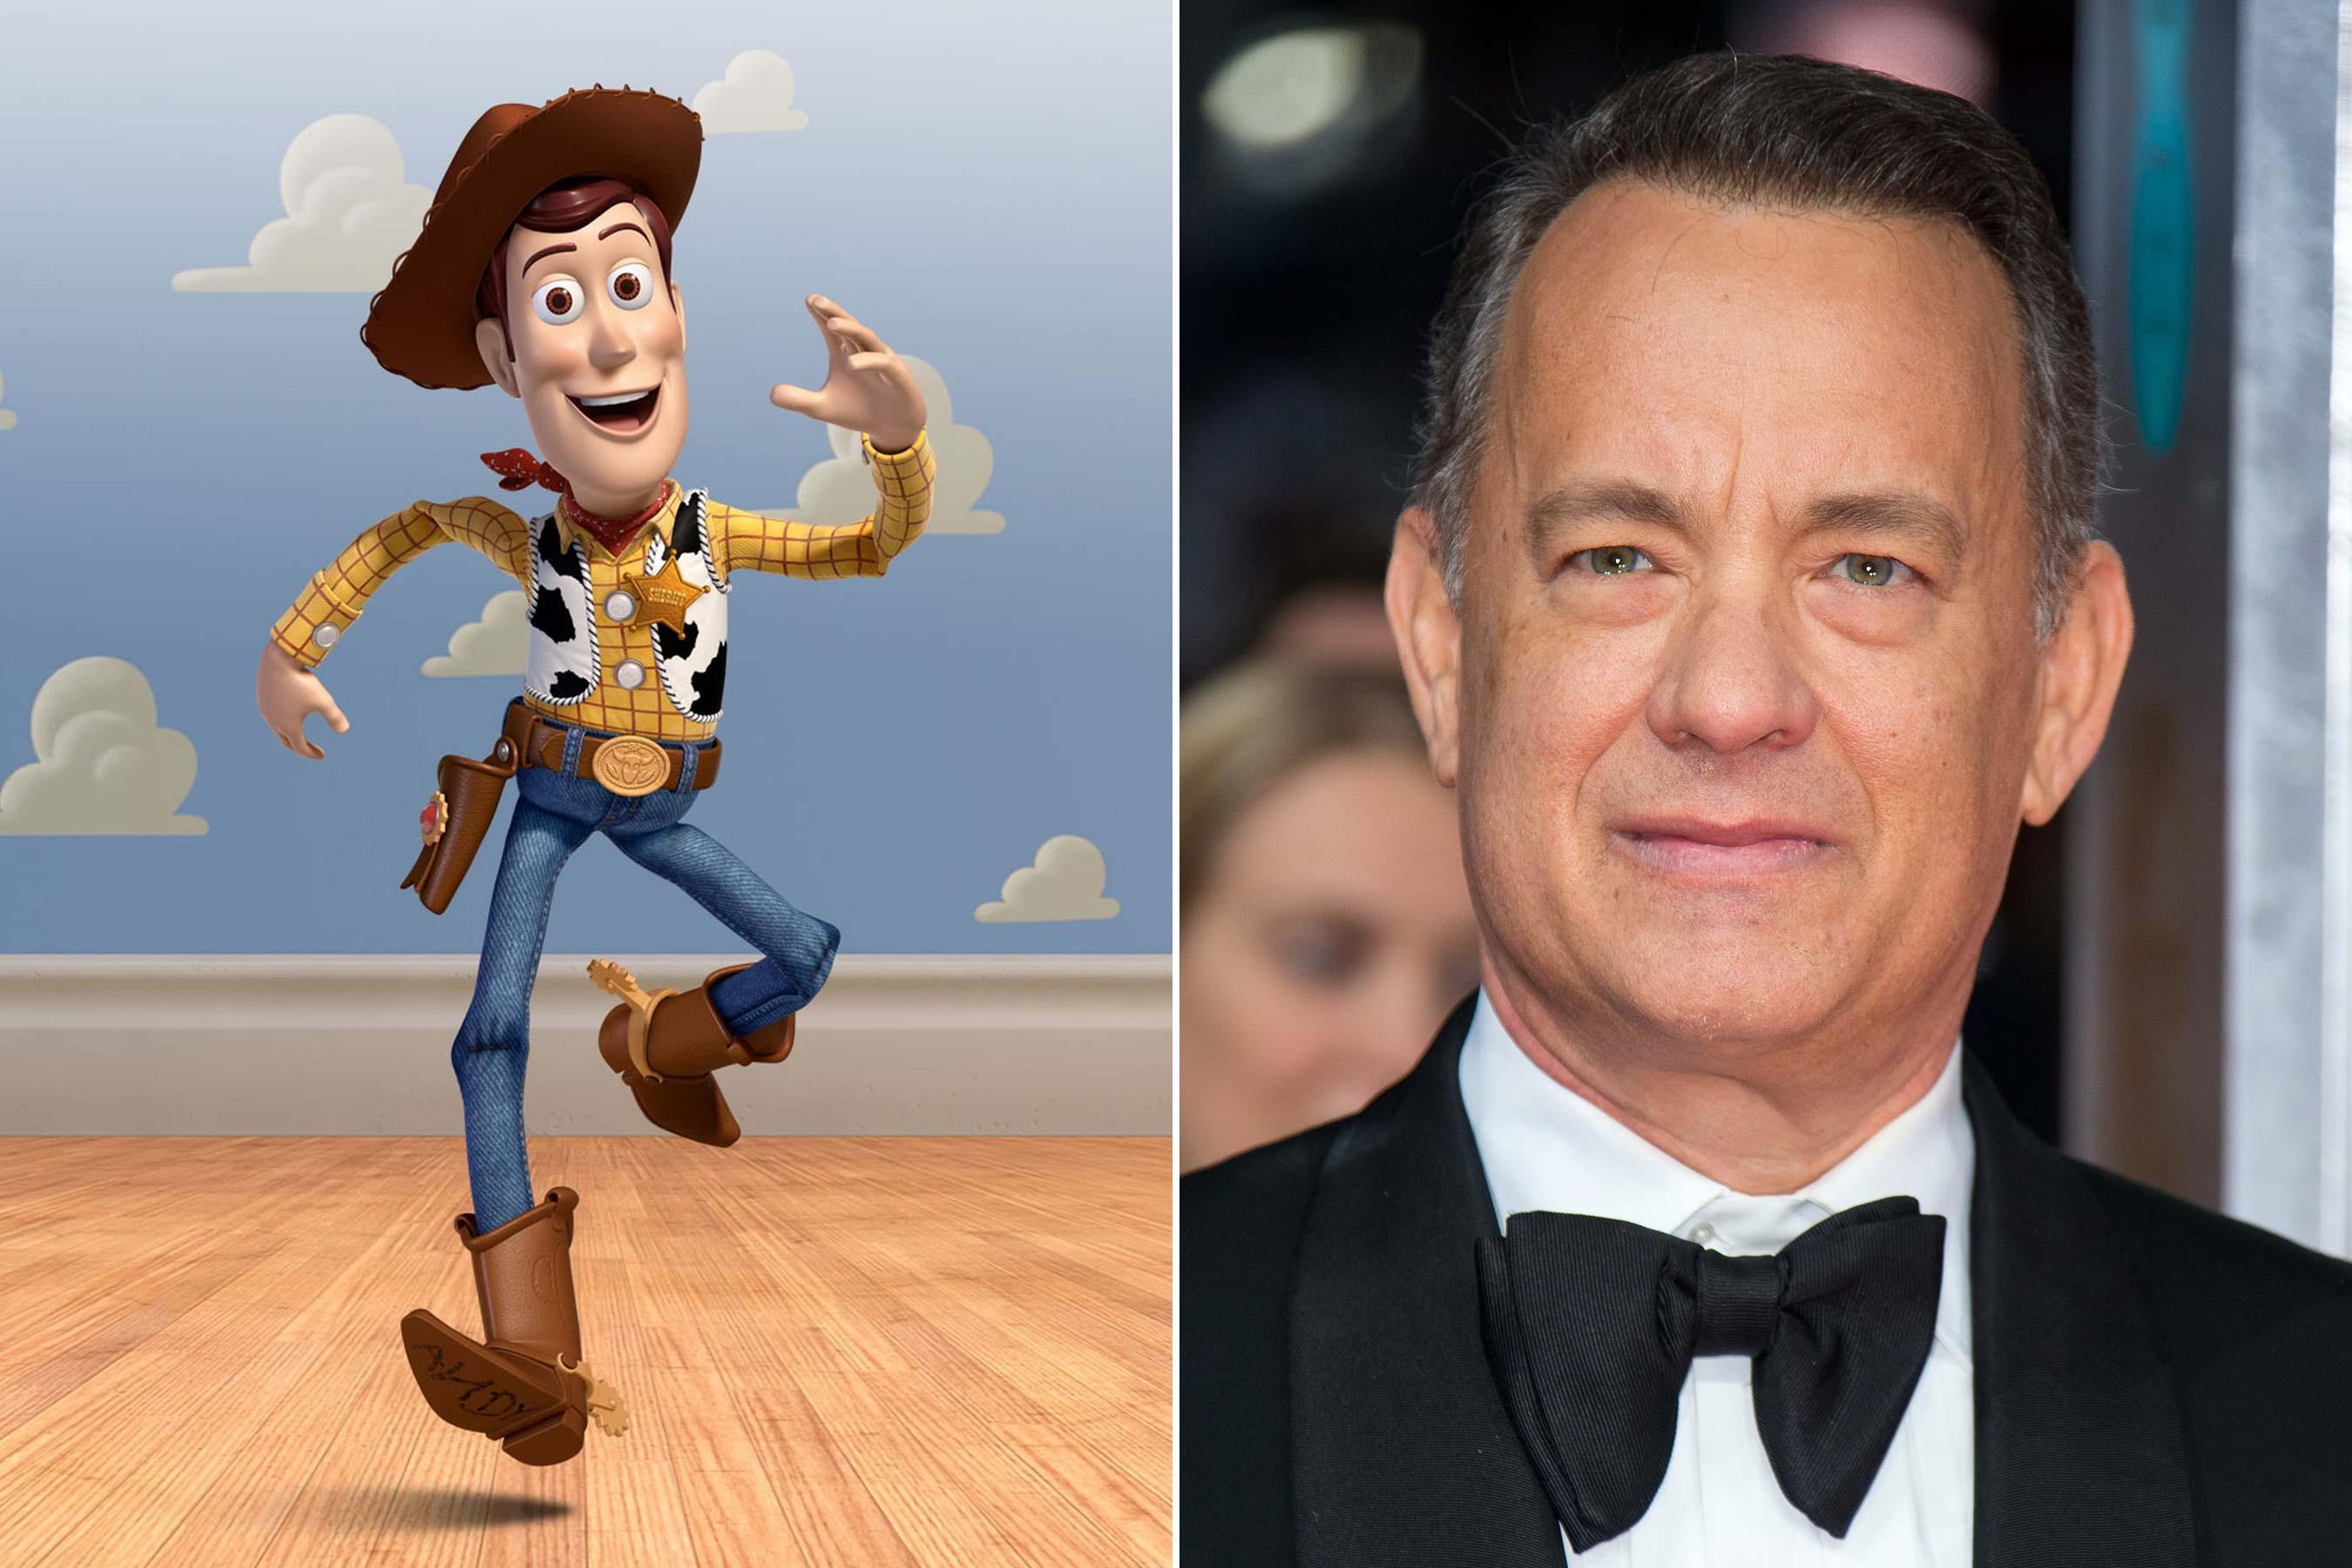 Woody - Tom Hanks (Toy Story 1-3)